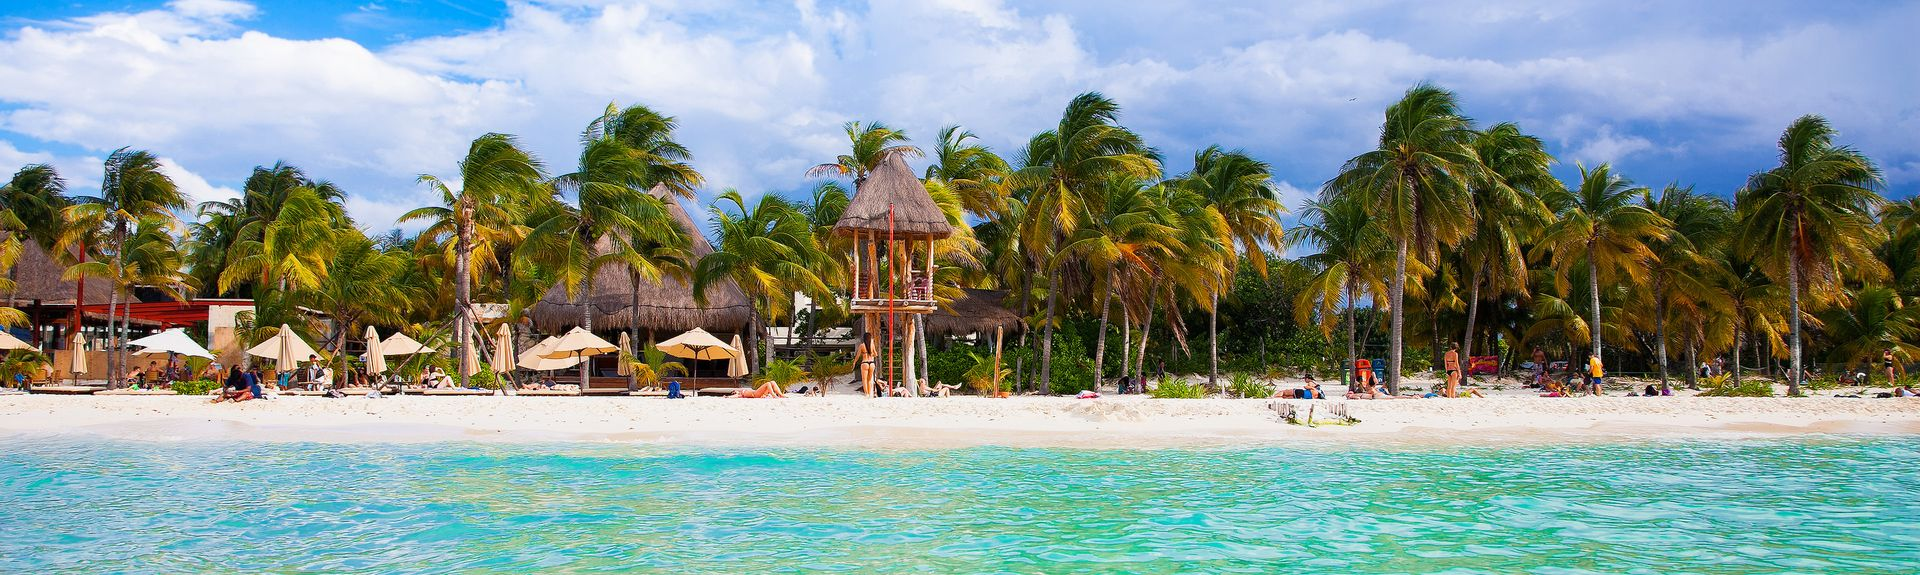 Isla Mujeres, Quintana Roo, Messico